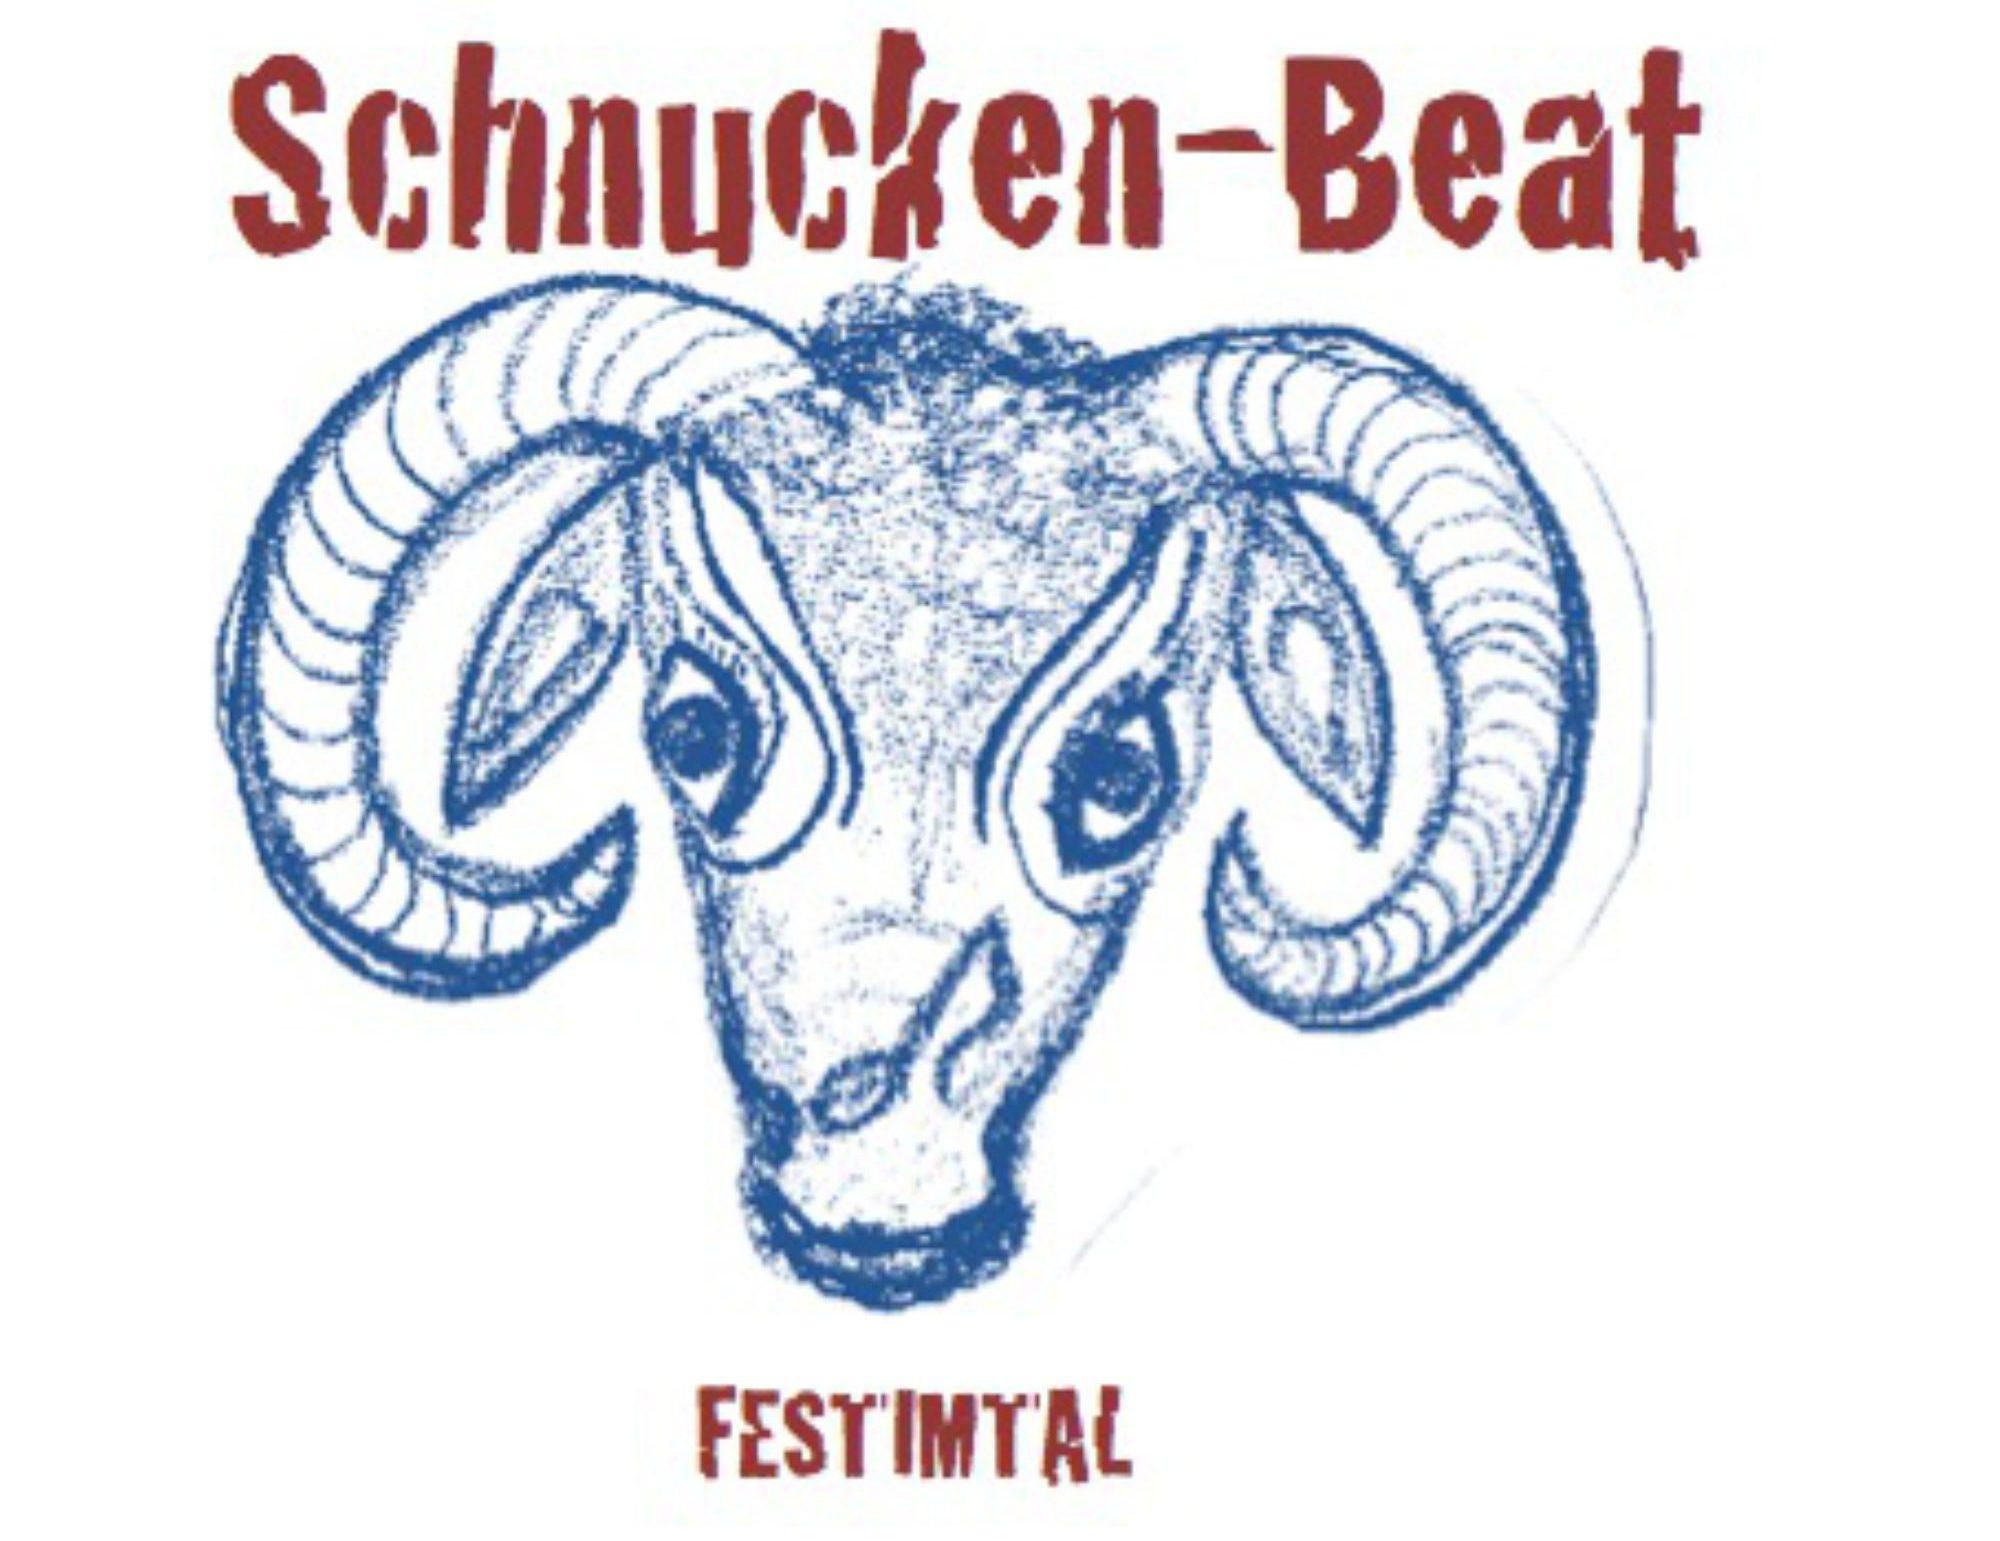 Schnucken-Beat